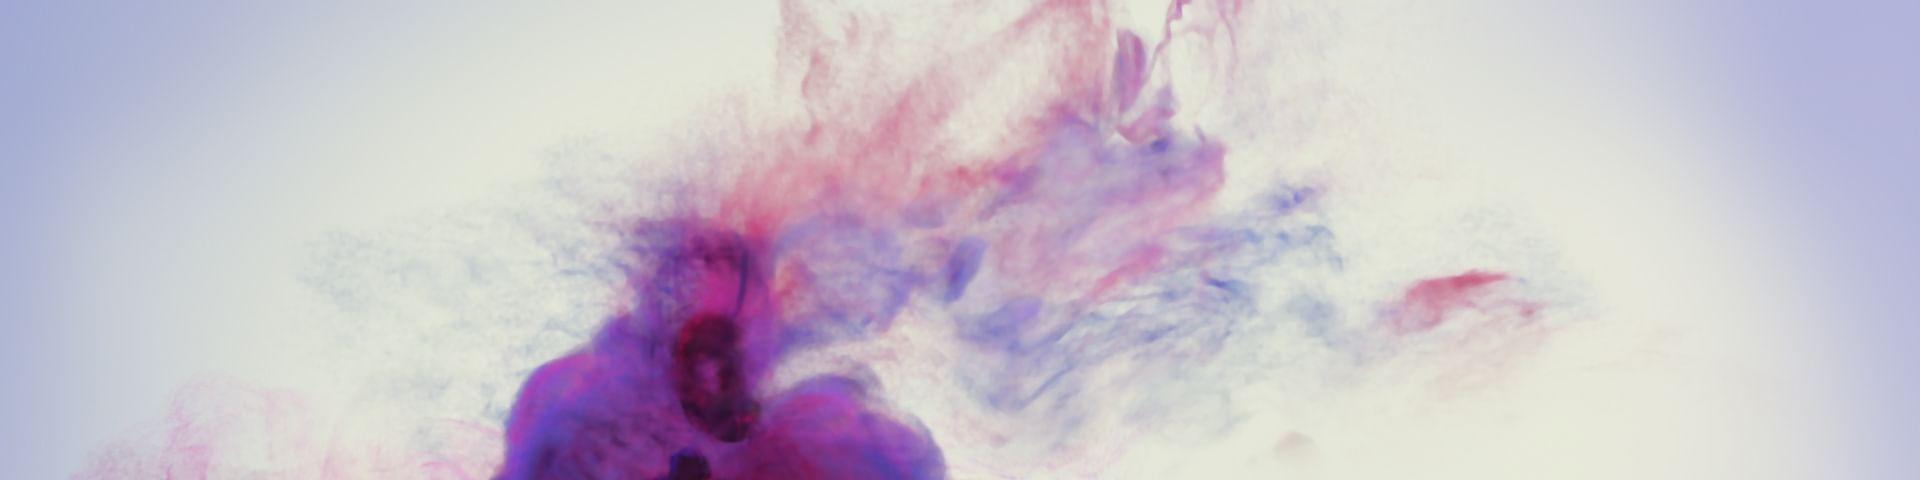 Marcel Binet,a Sailor in Indochina